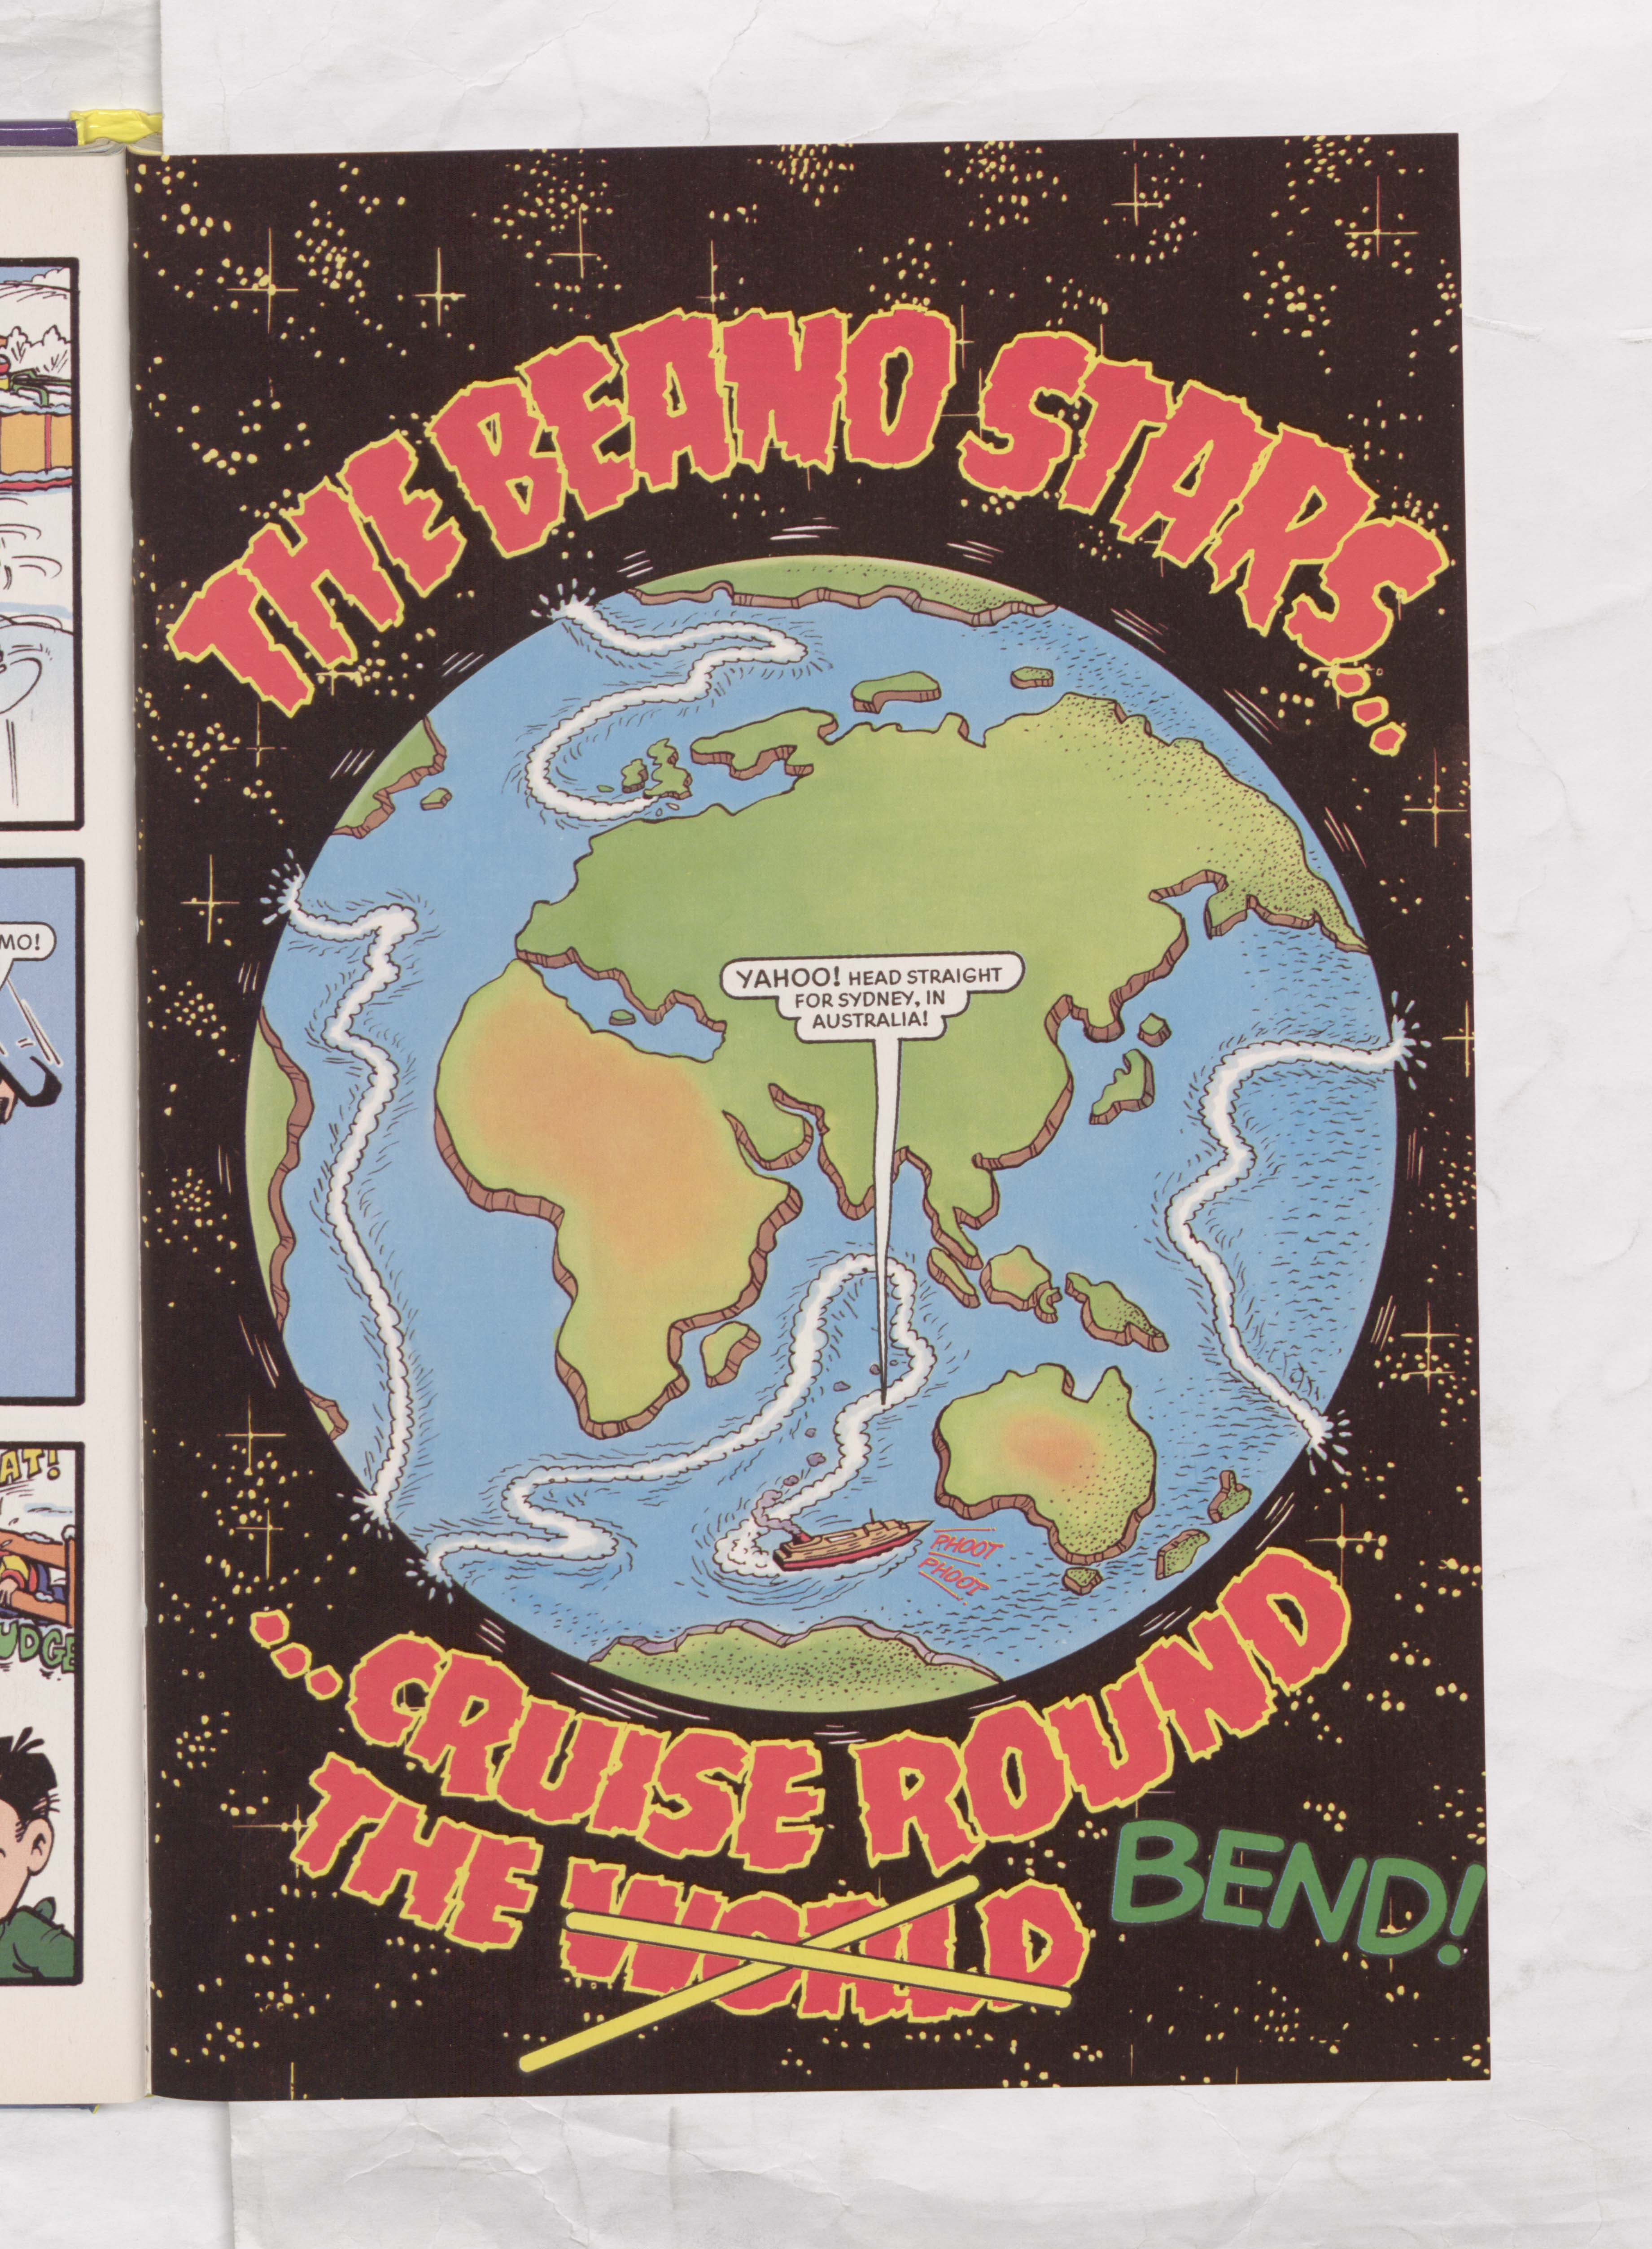 The Beano Stars Cruise Round the World - Beano Book 2000 Annual - Page 1